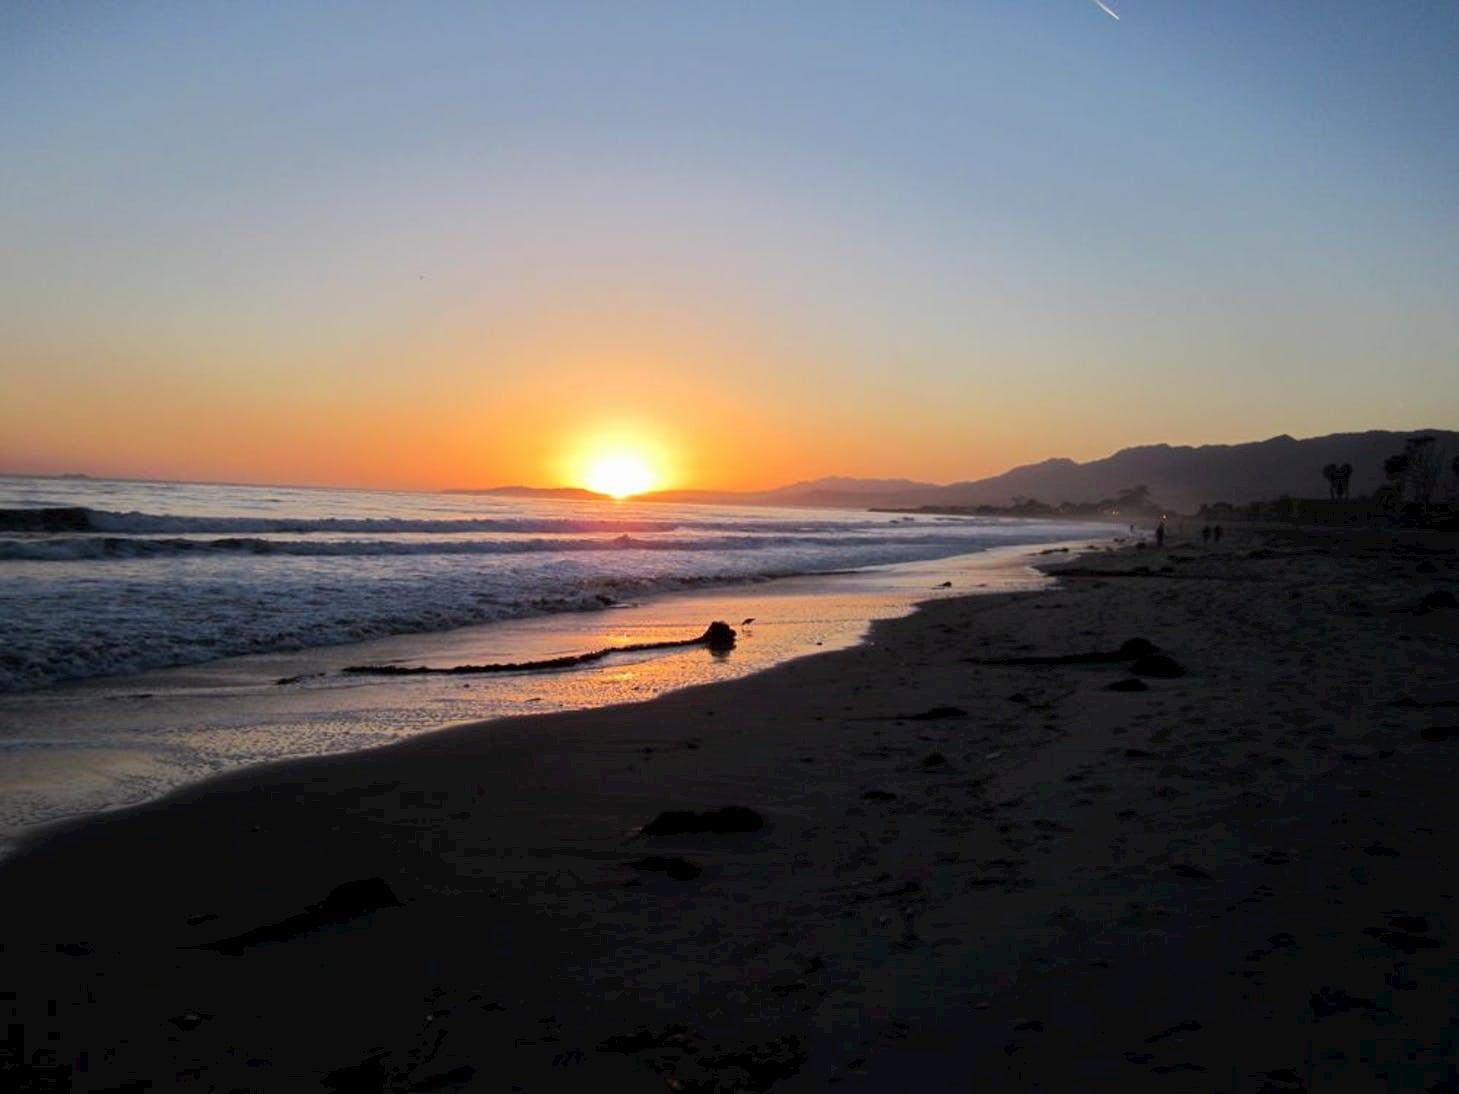 Sunset over a beach with oceanside cliffs.